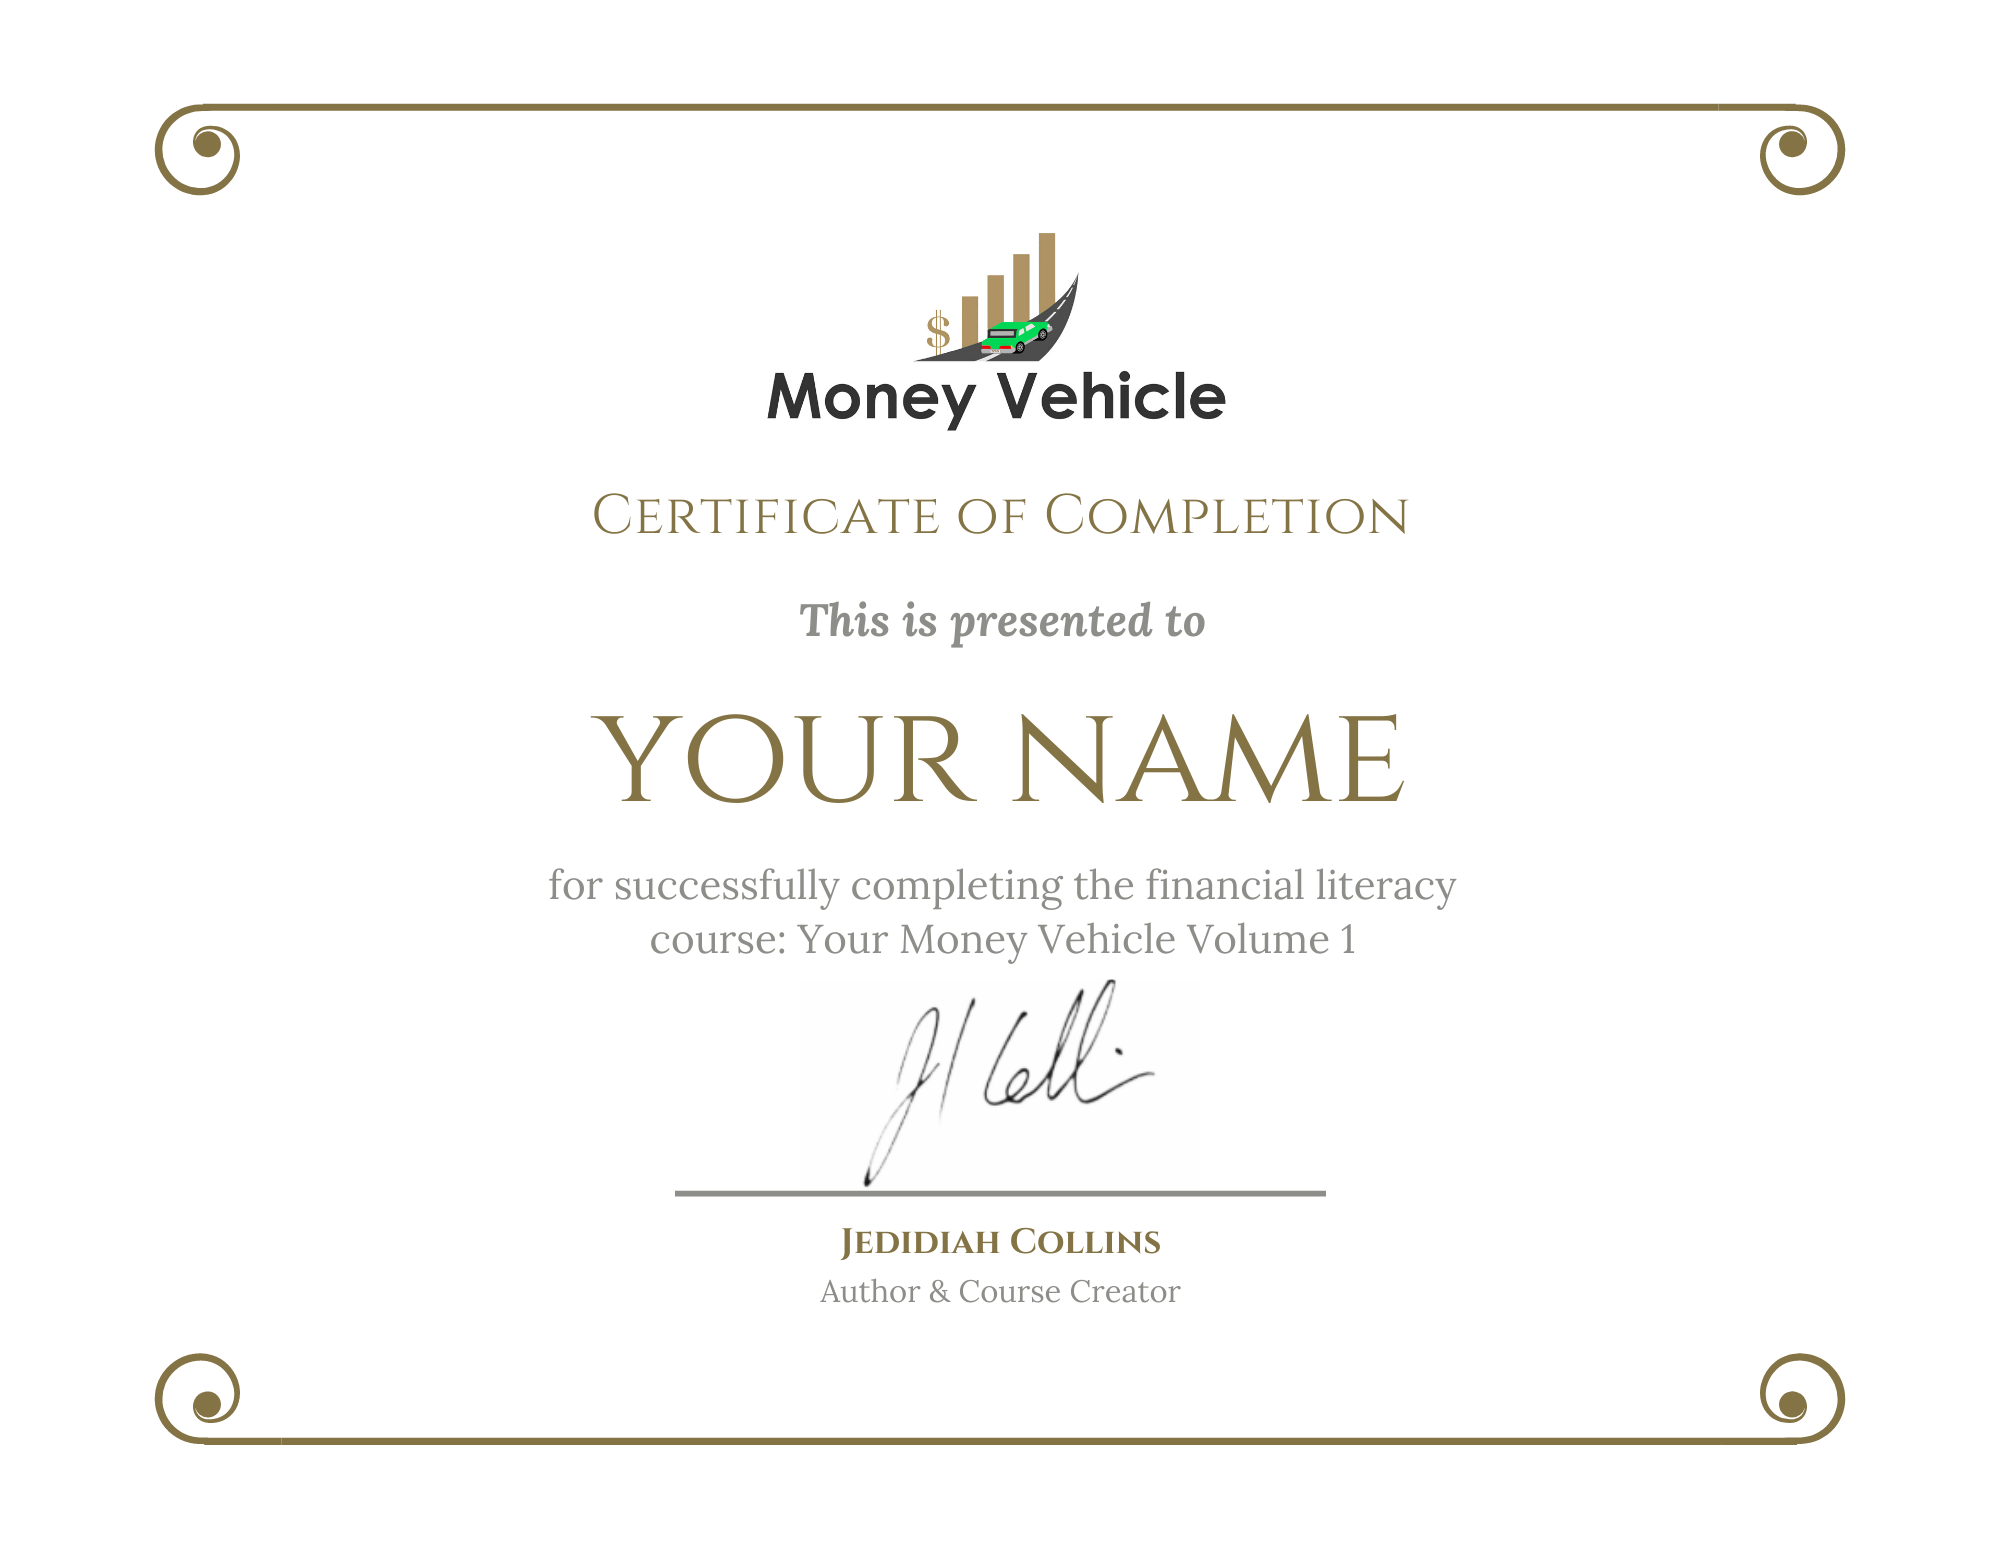 Money Vehicle Certification